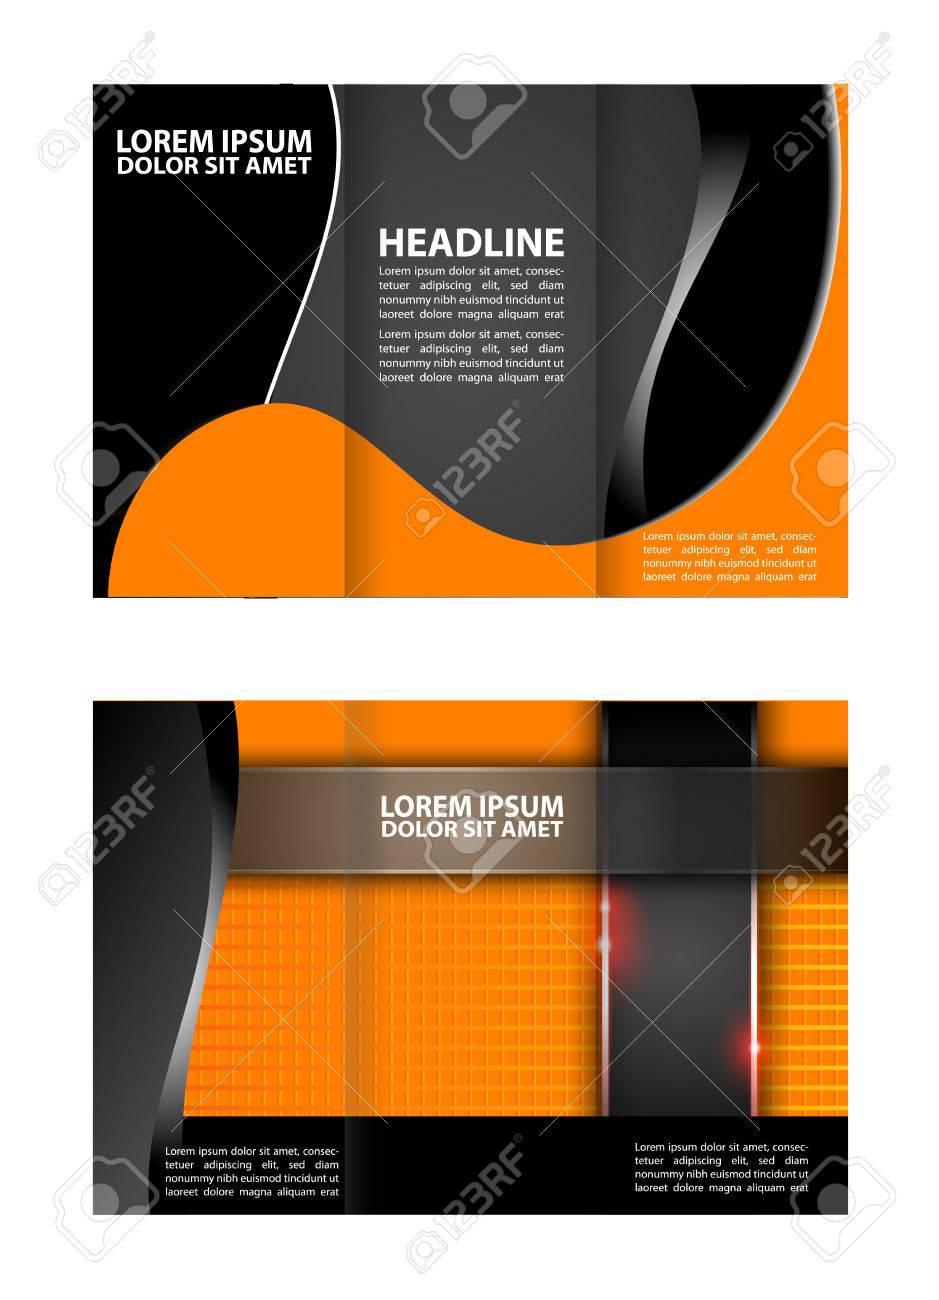 trifold brochure template design empty vector ロイヤリティフリー